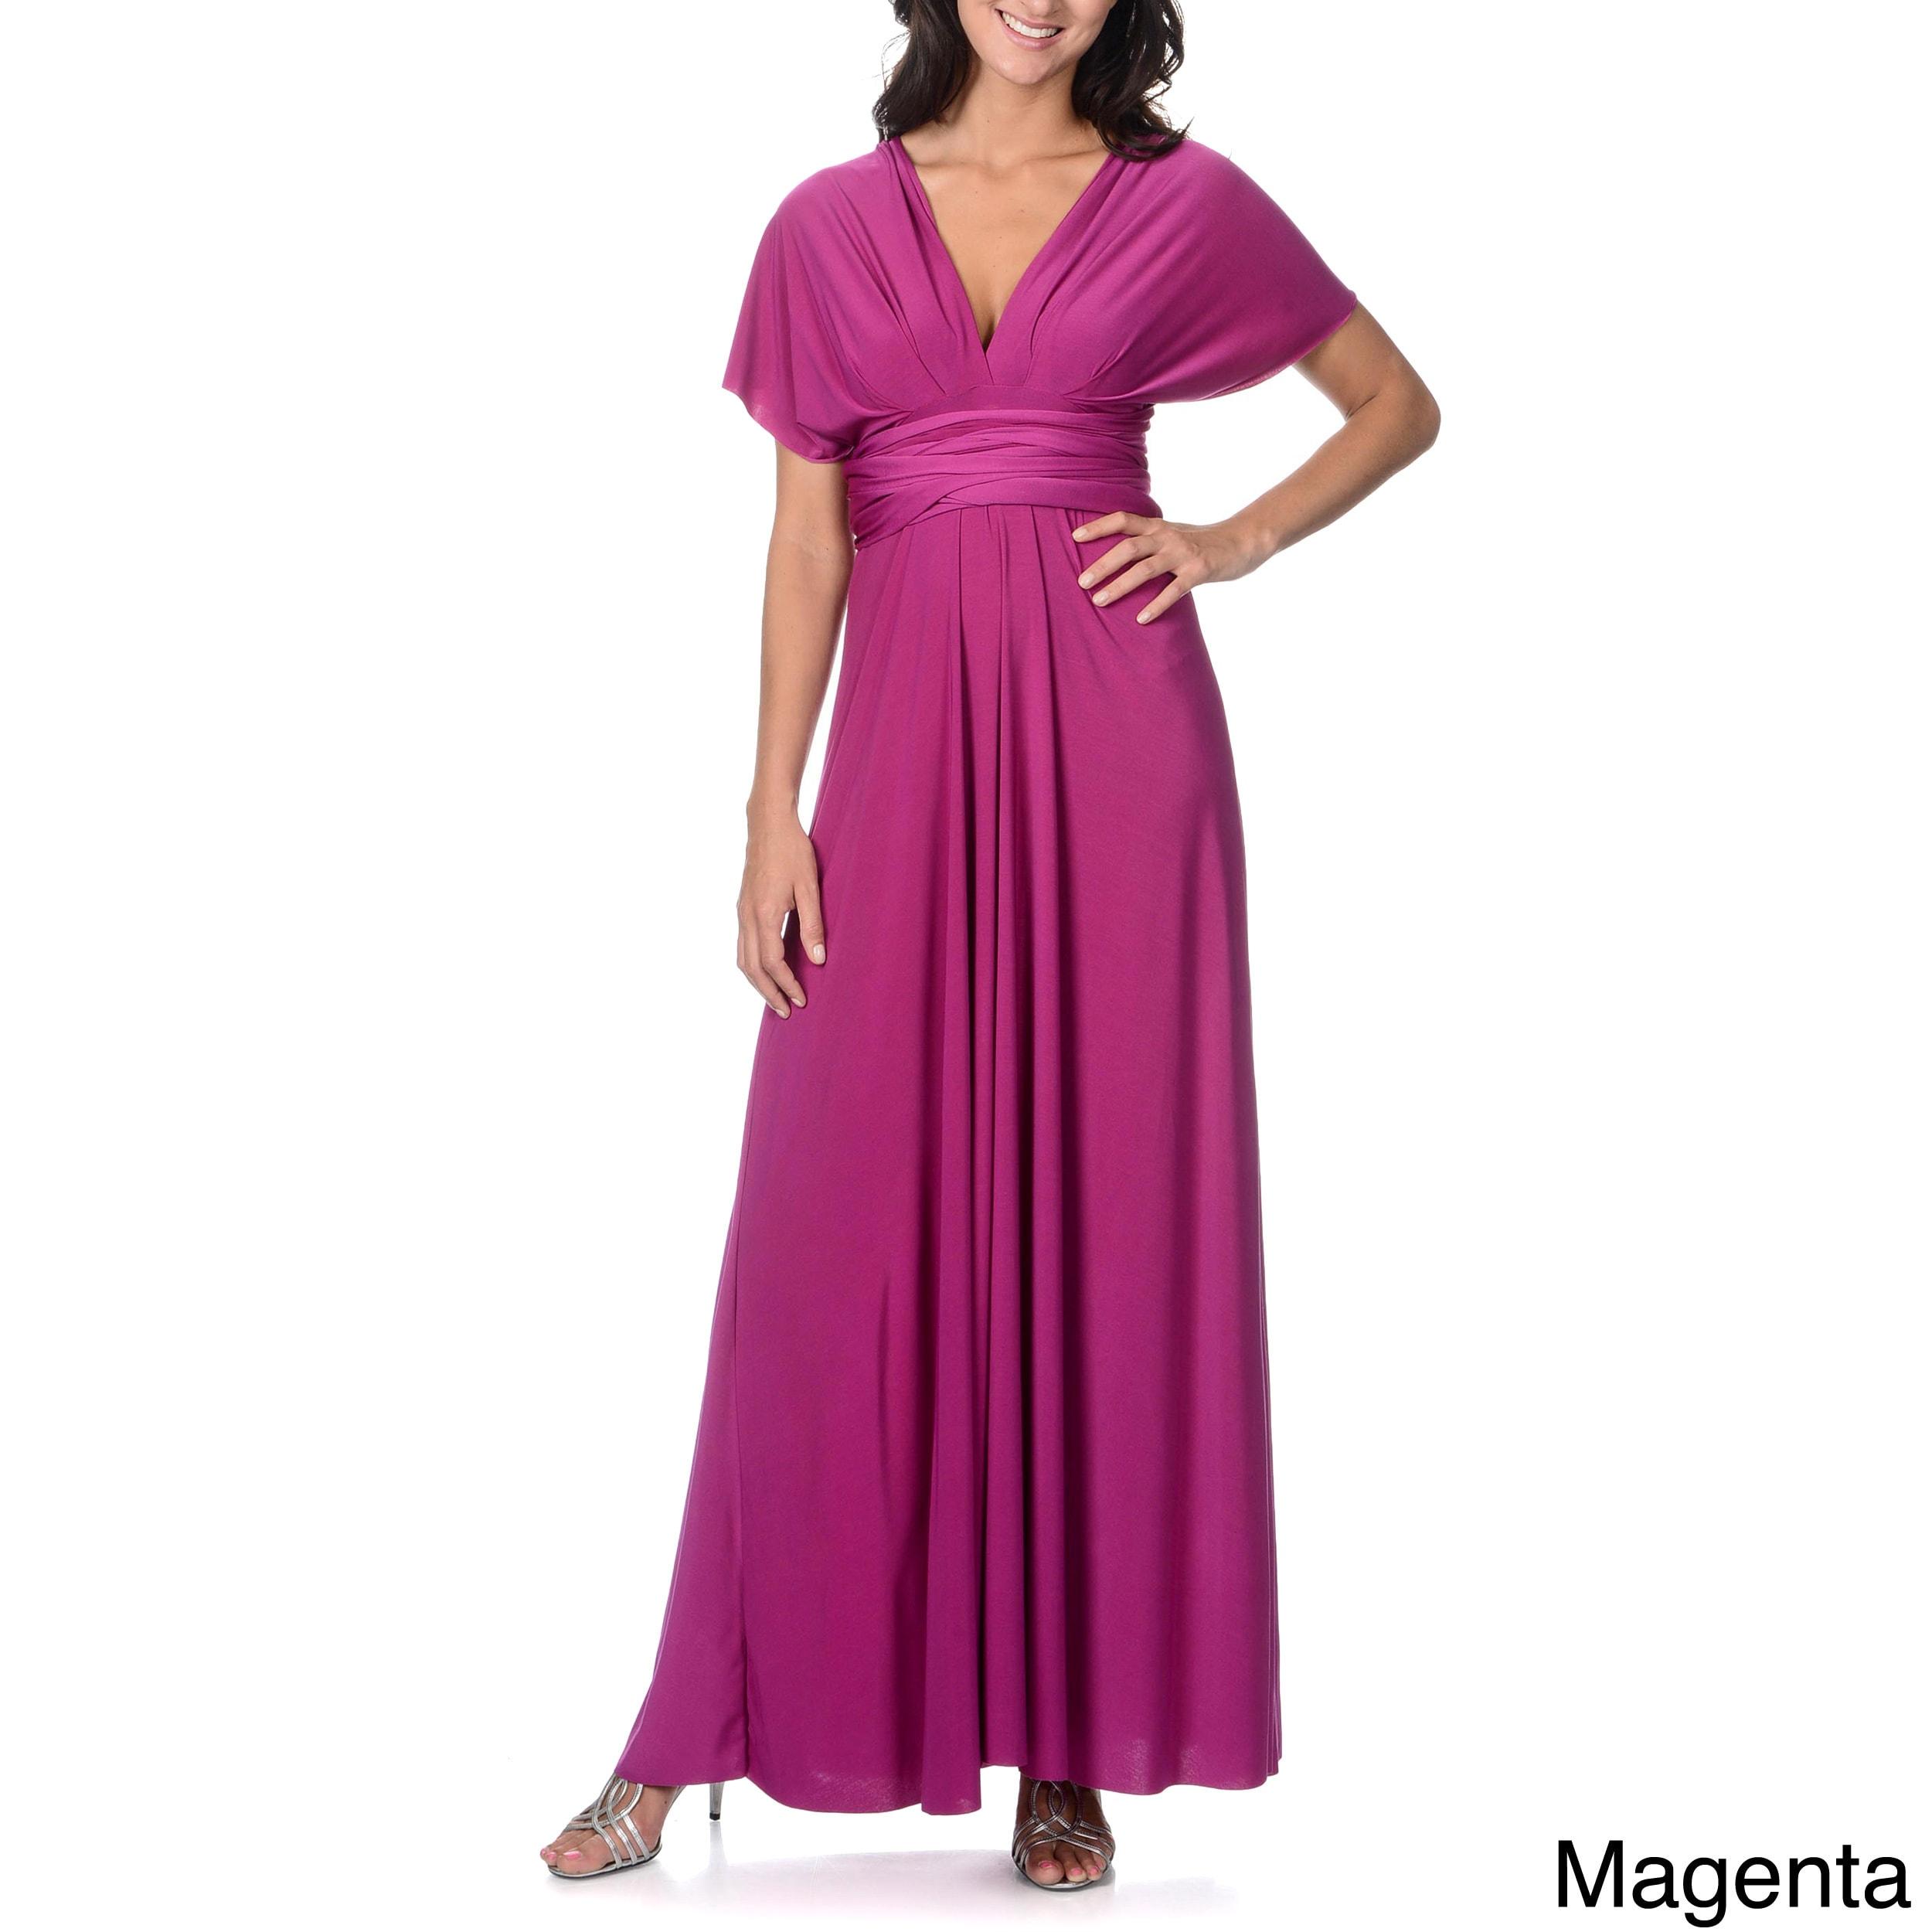 Von Ronen New York Women's Long Transformer Dress One Size Fits 0-12 at Sears.com